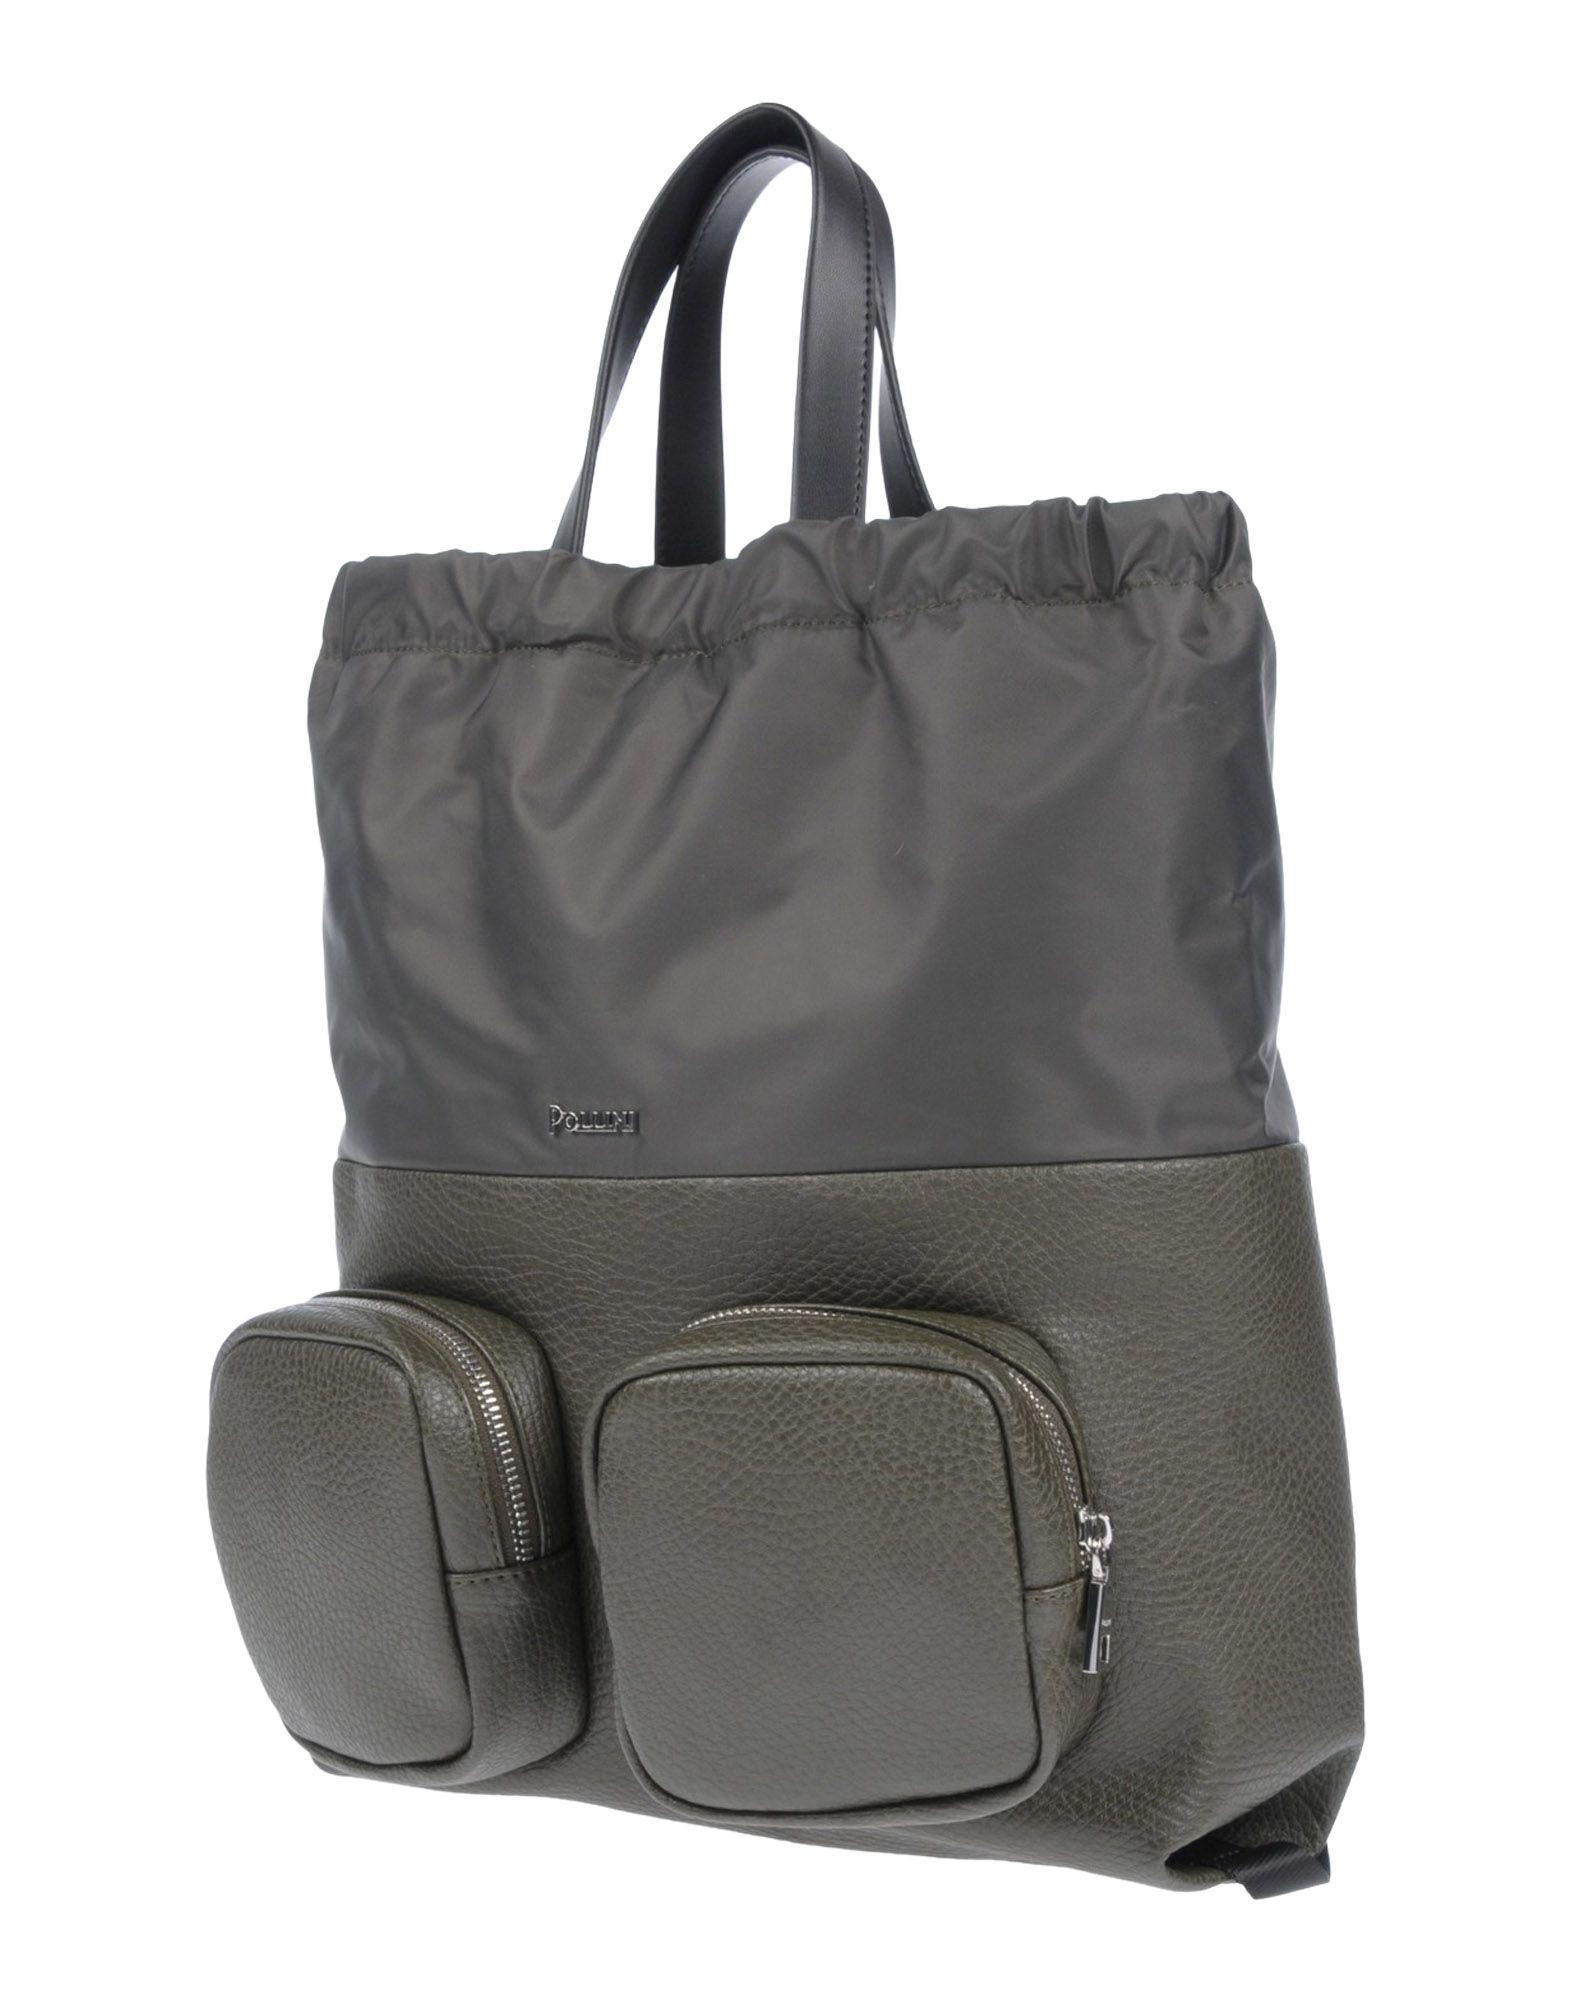 Bags Bum Backpacks amp; Pollini Lyst pxzHfqSqw